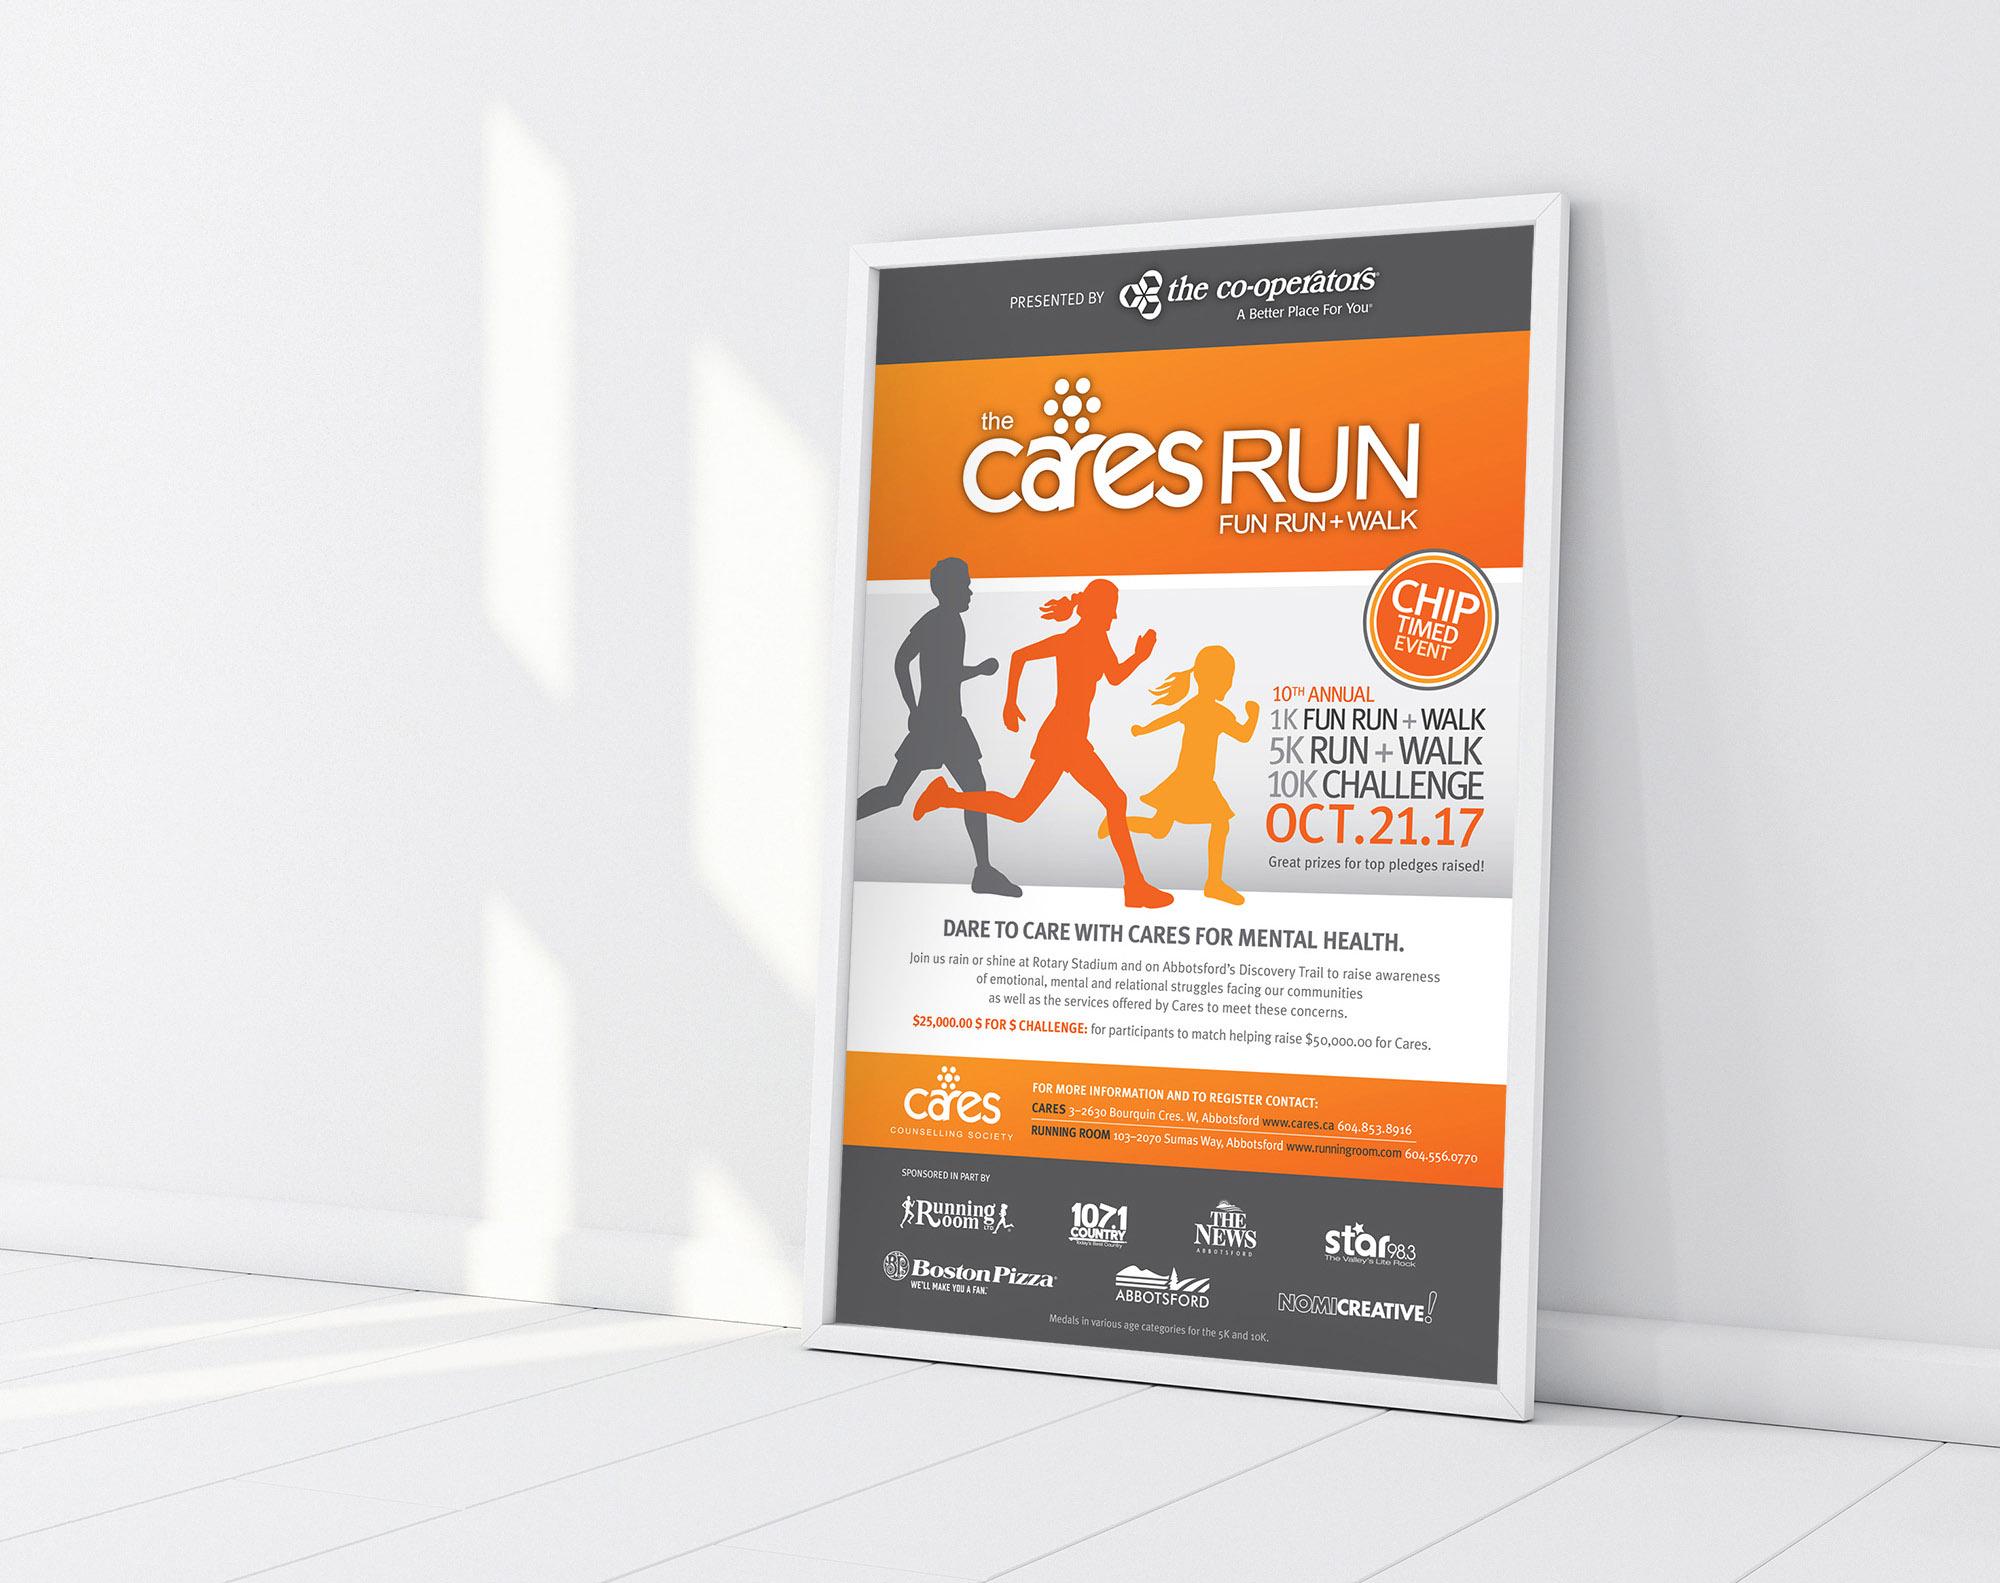 Cares_Run_Poster.jpg